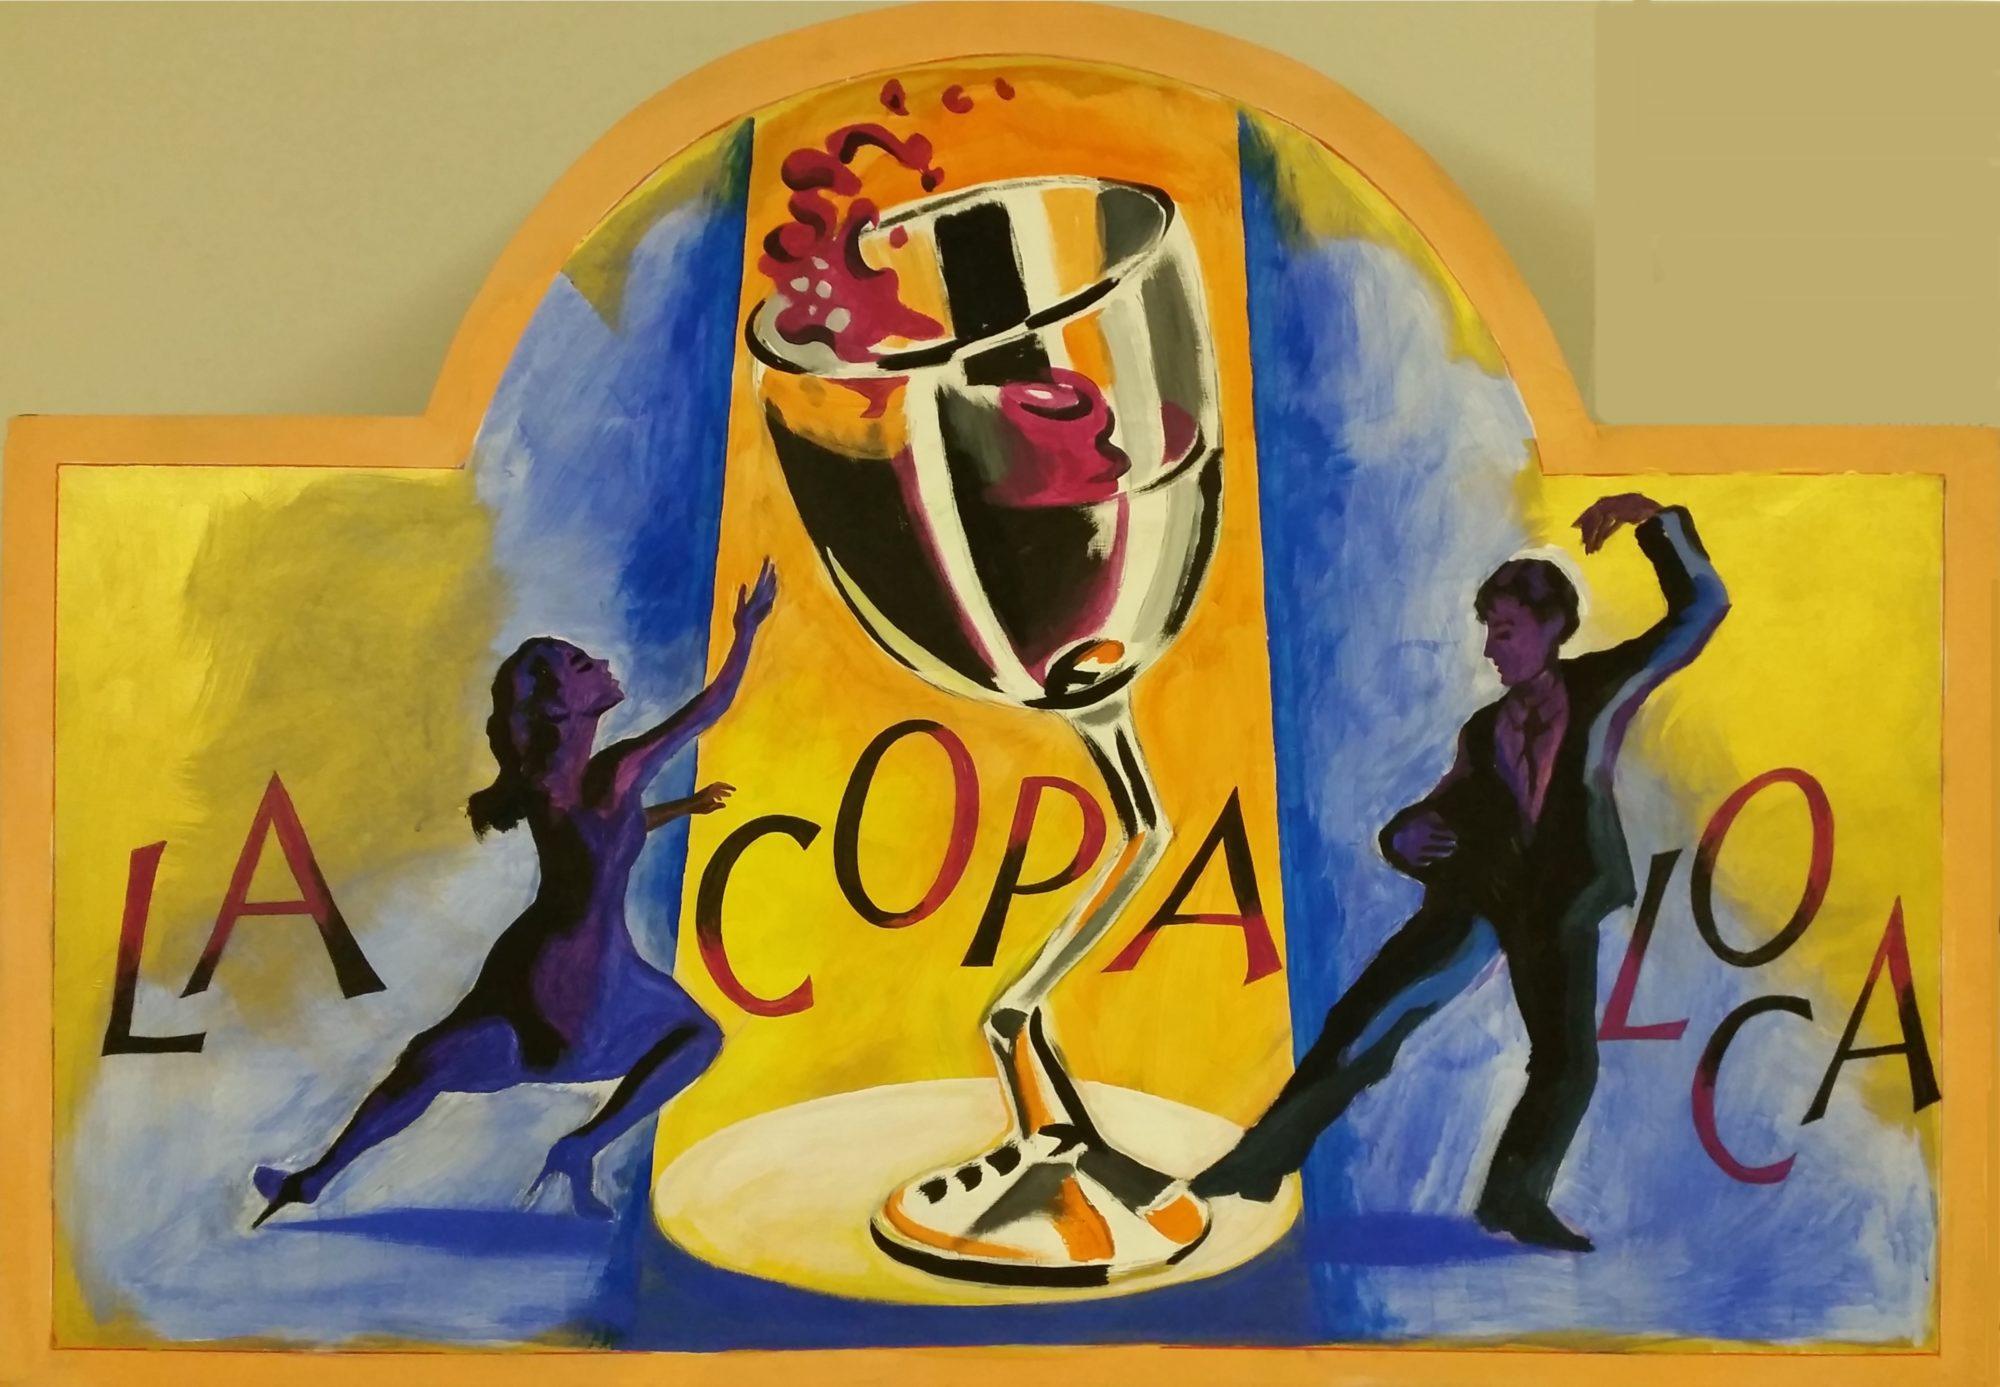 La Copa Loca Marathon